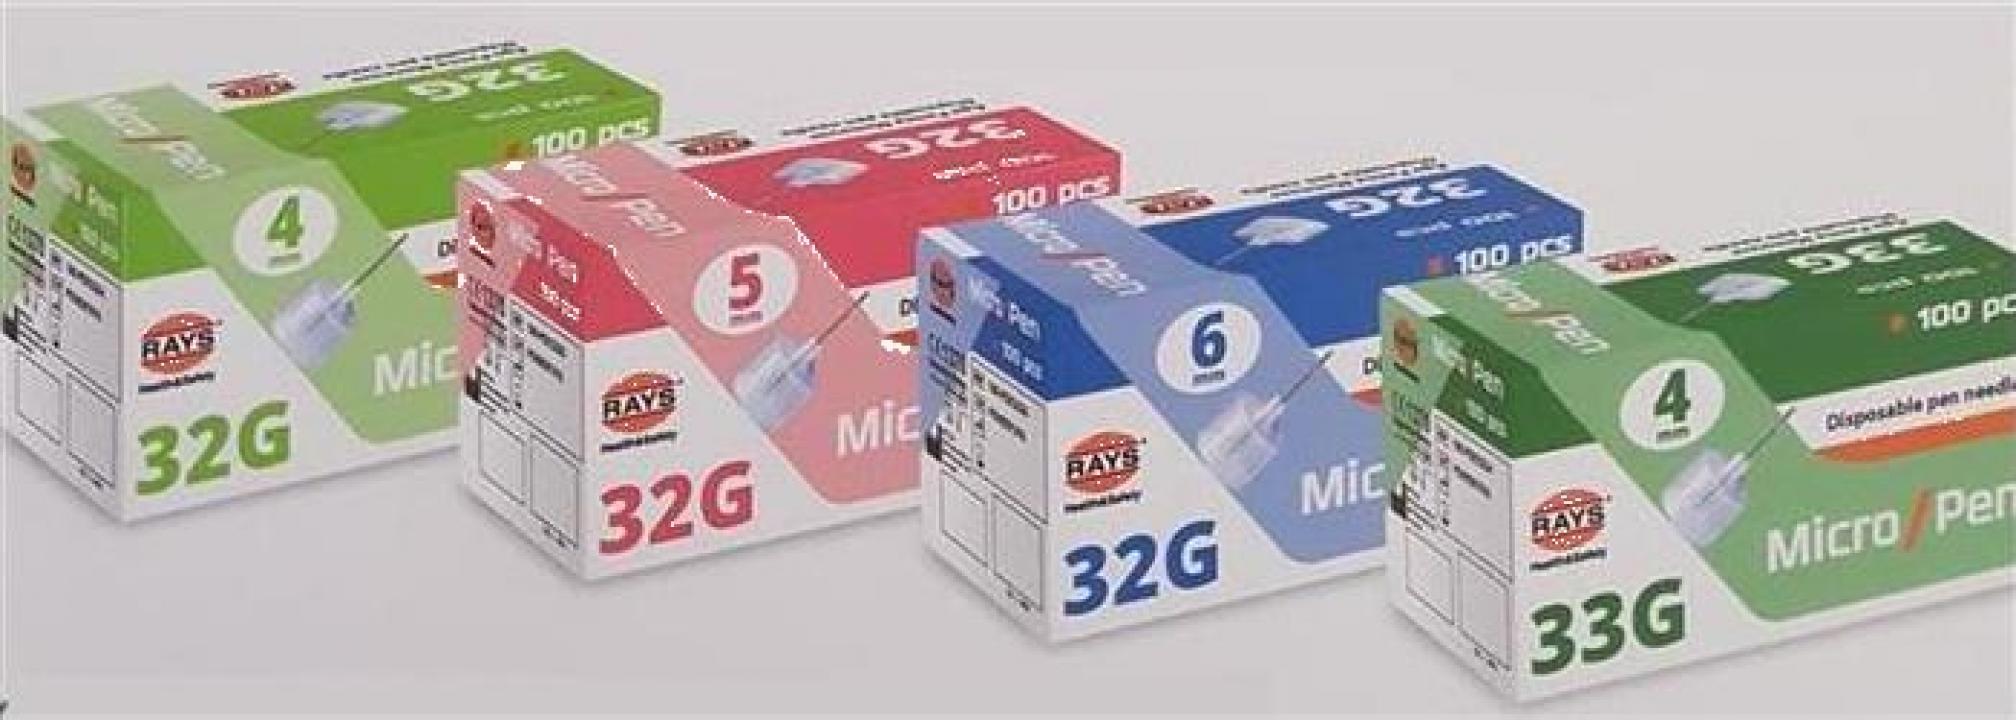 Ace insulina pen Rays - 32g